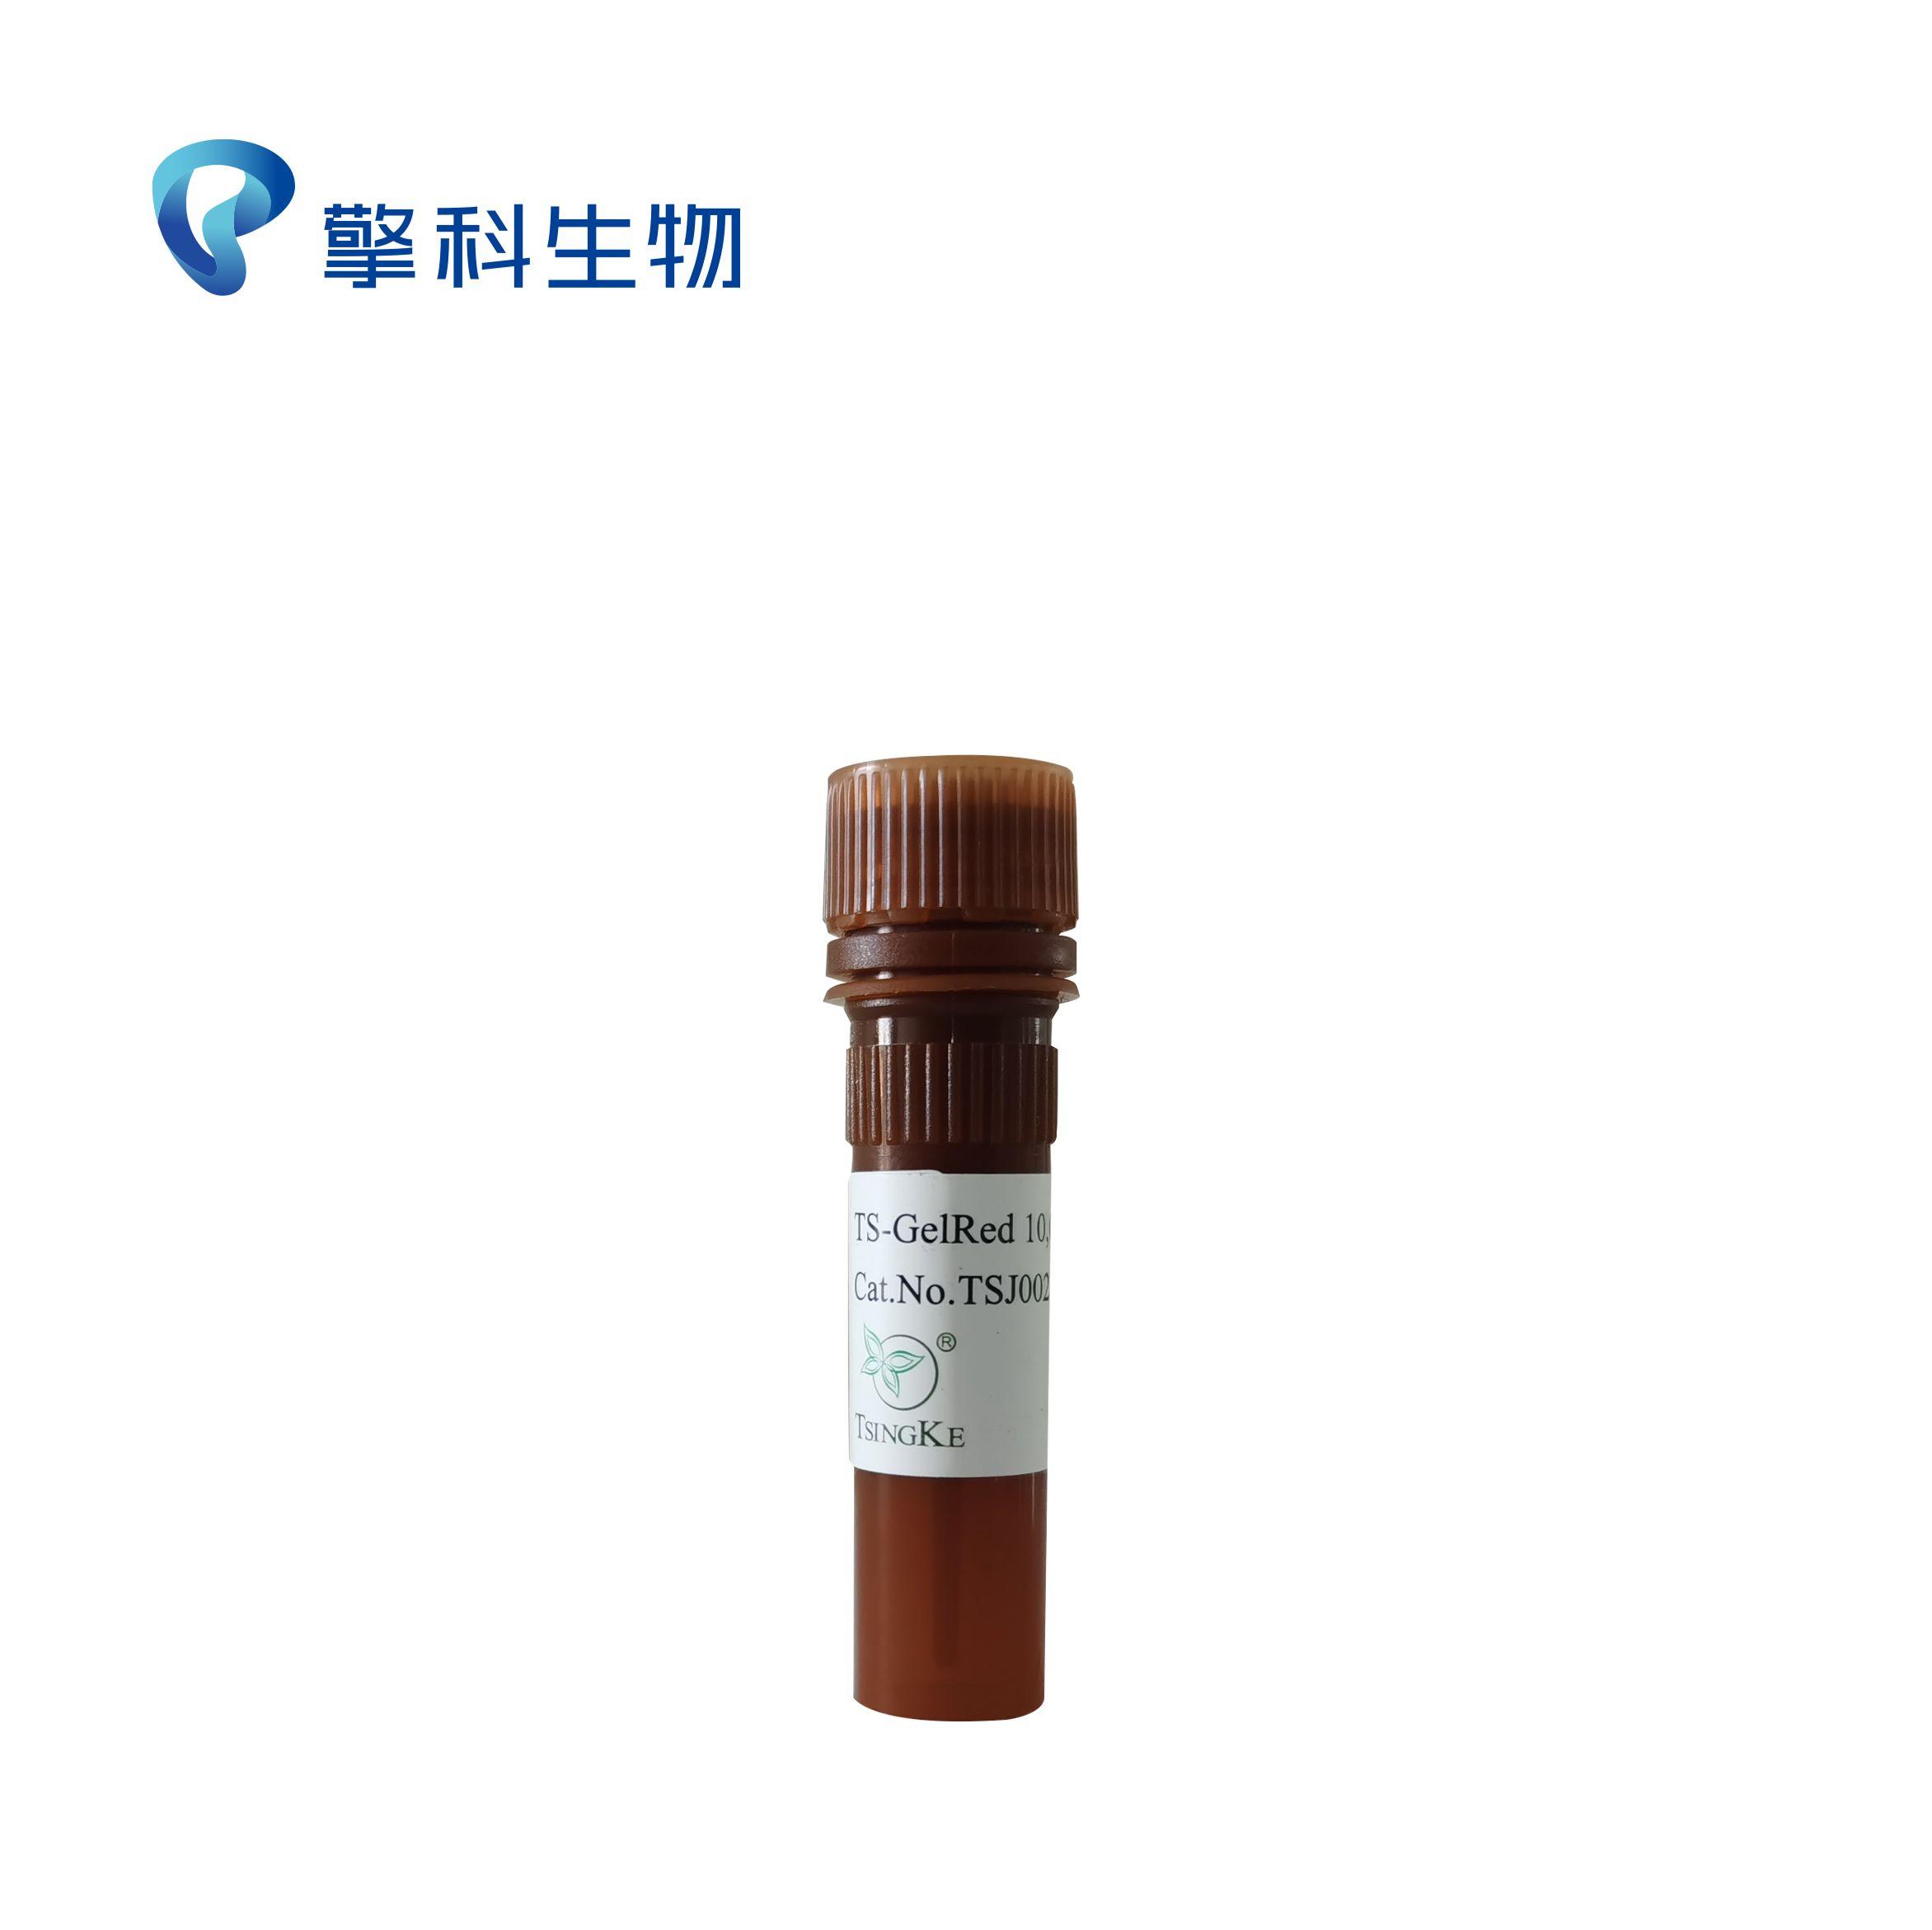 TS-GelRed 核酸凝胶染料 Ver.2(10,000×水溶液)/核酸电泳系列试剂/擎科生物TSINGKE